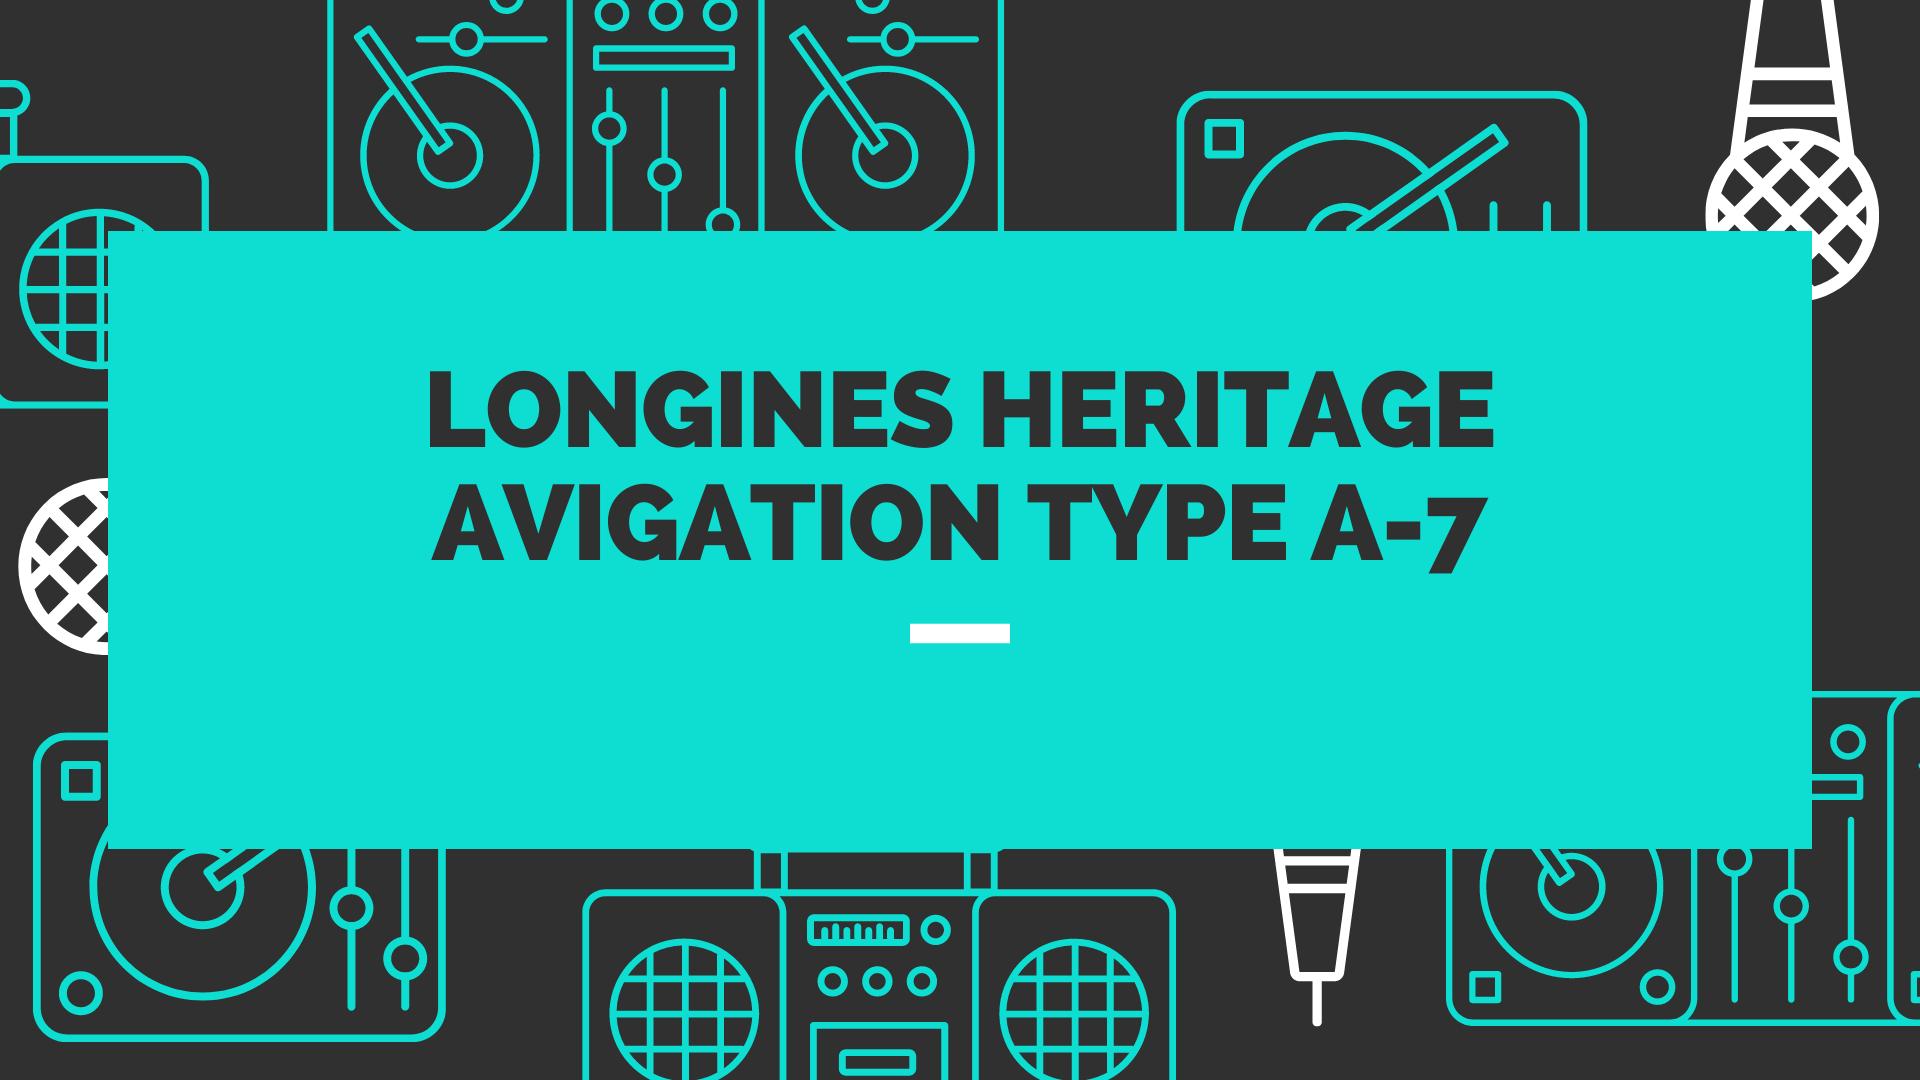 Longines Heritage Avigation Type A-7